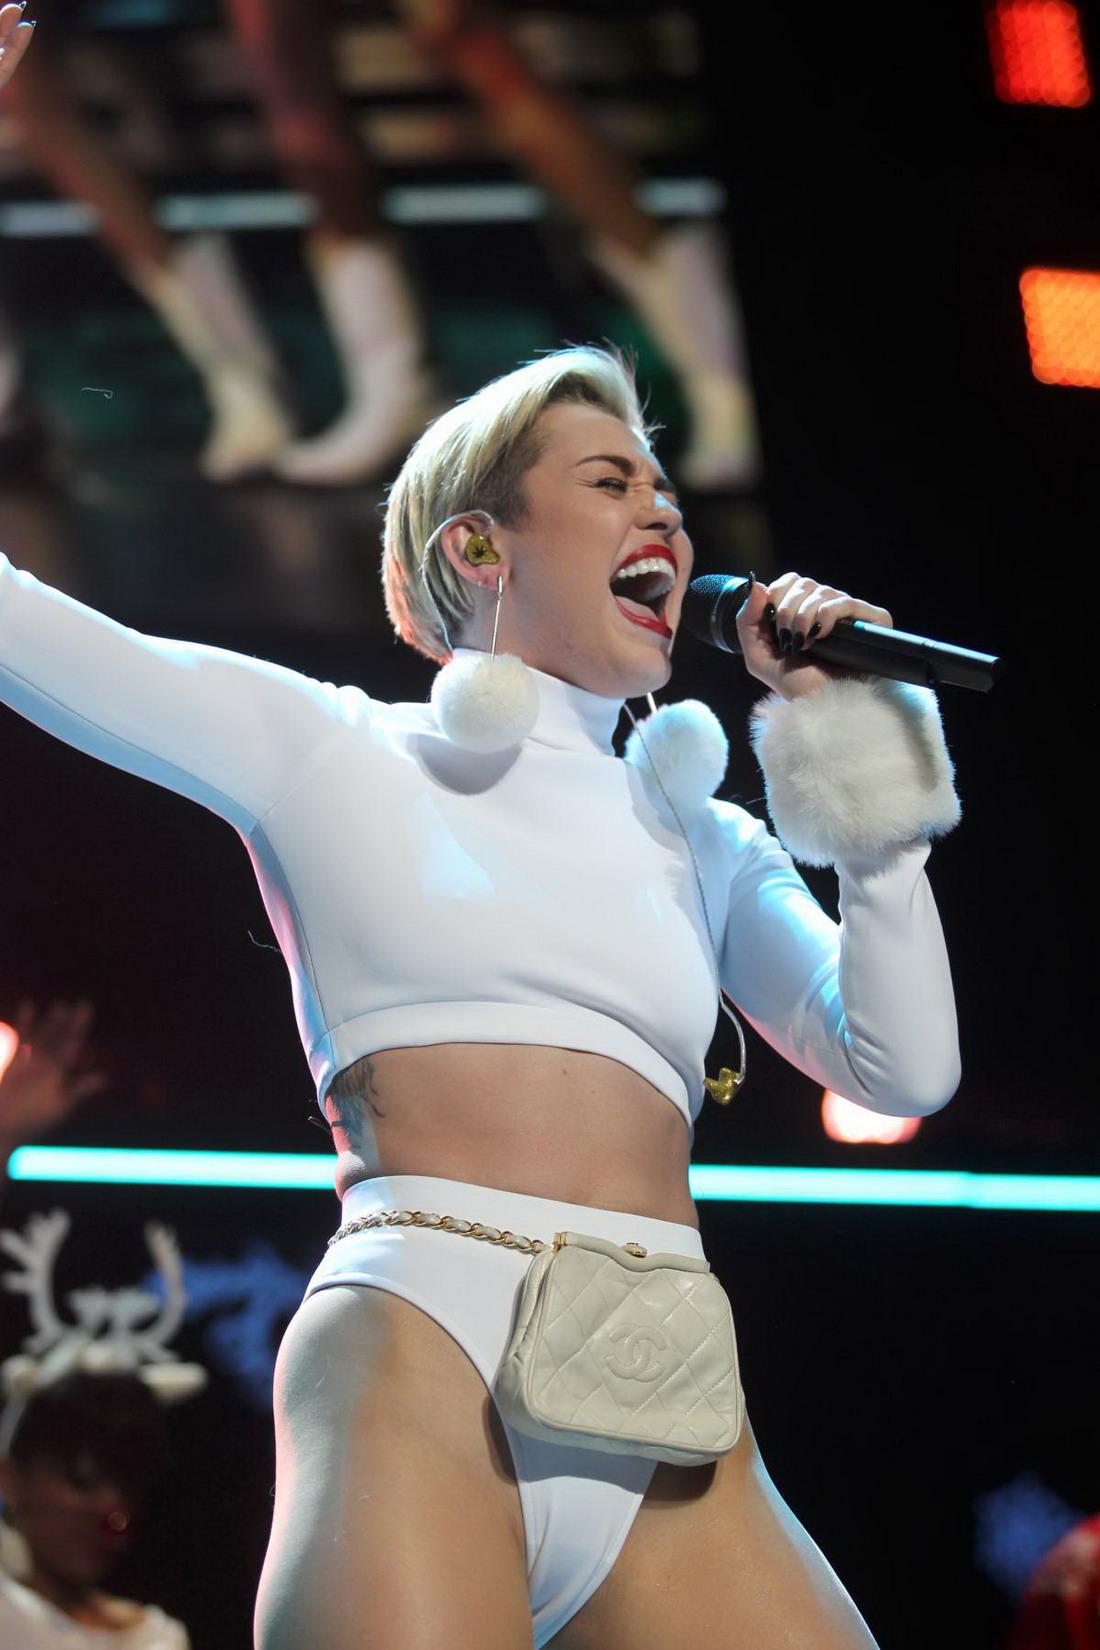 Miley Cyrus – Hot